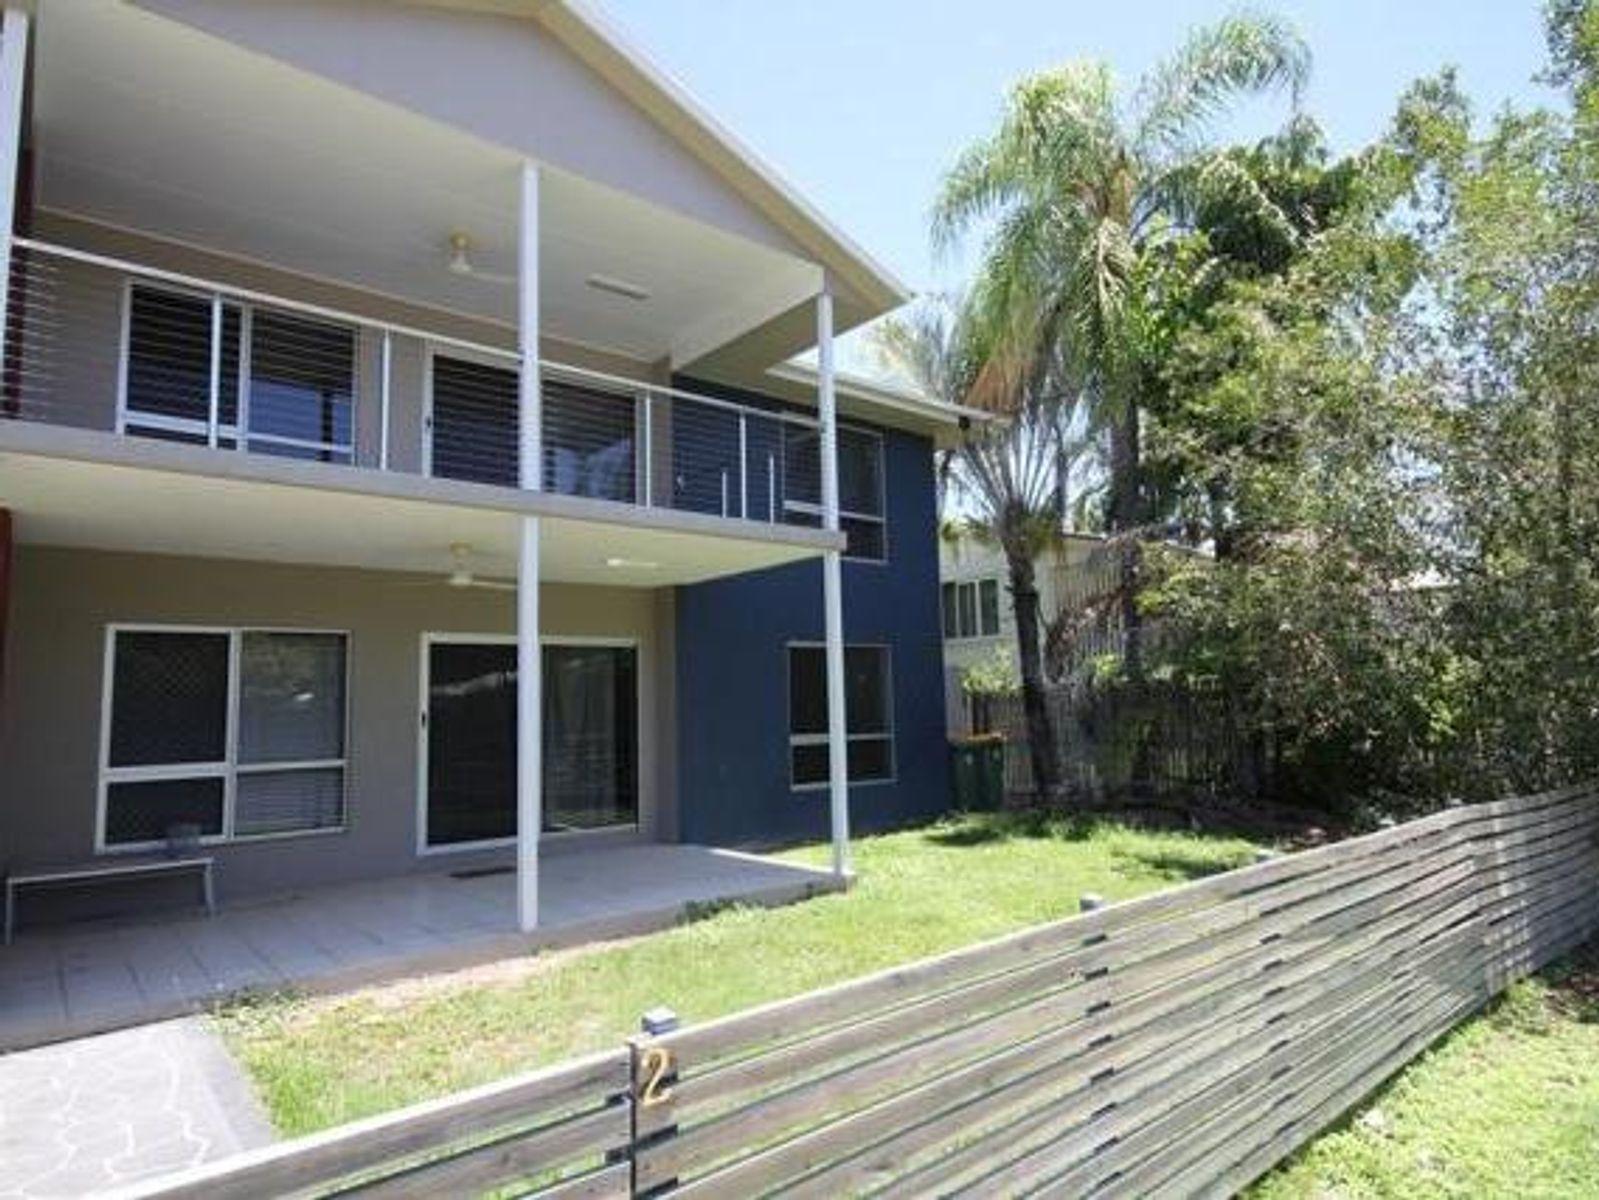 2/89 Burt Street, Aitkenvale, QLD 4814